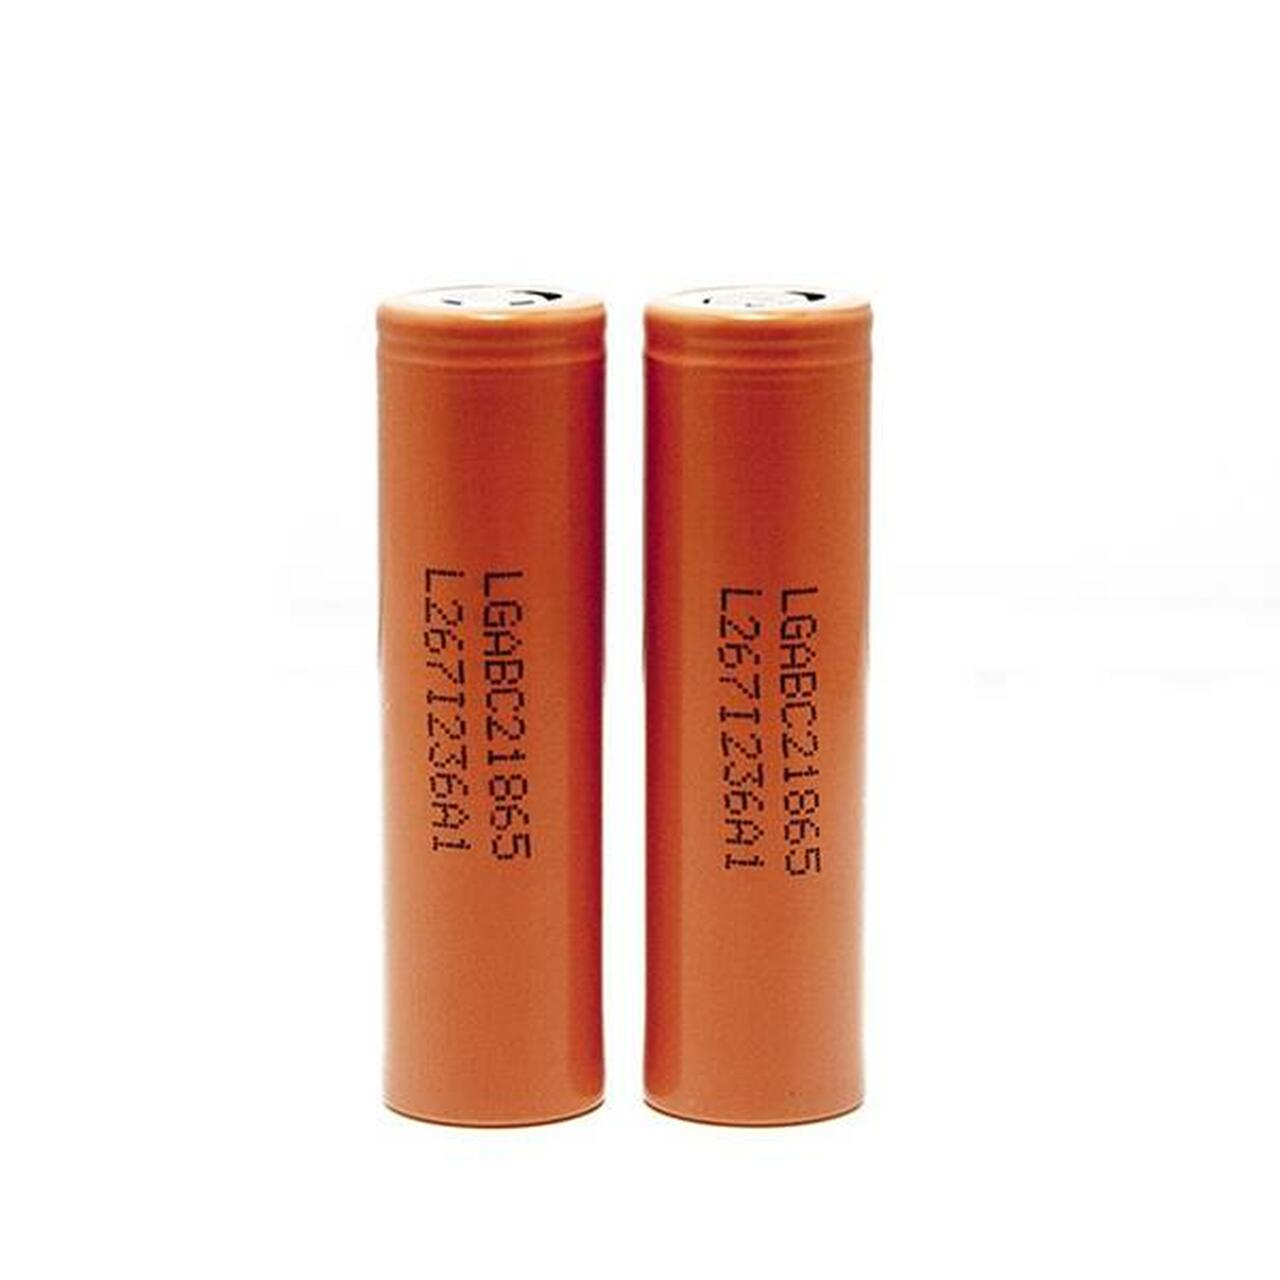 LGABC21865 LG 18650 Type Model 3.7v 2800mah Lithium-ion Battery (Refurbished)